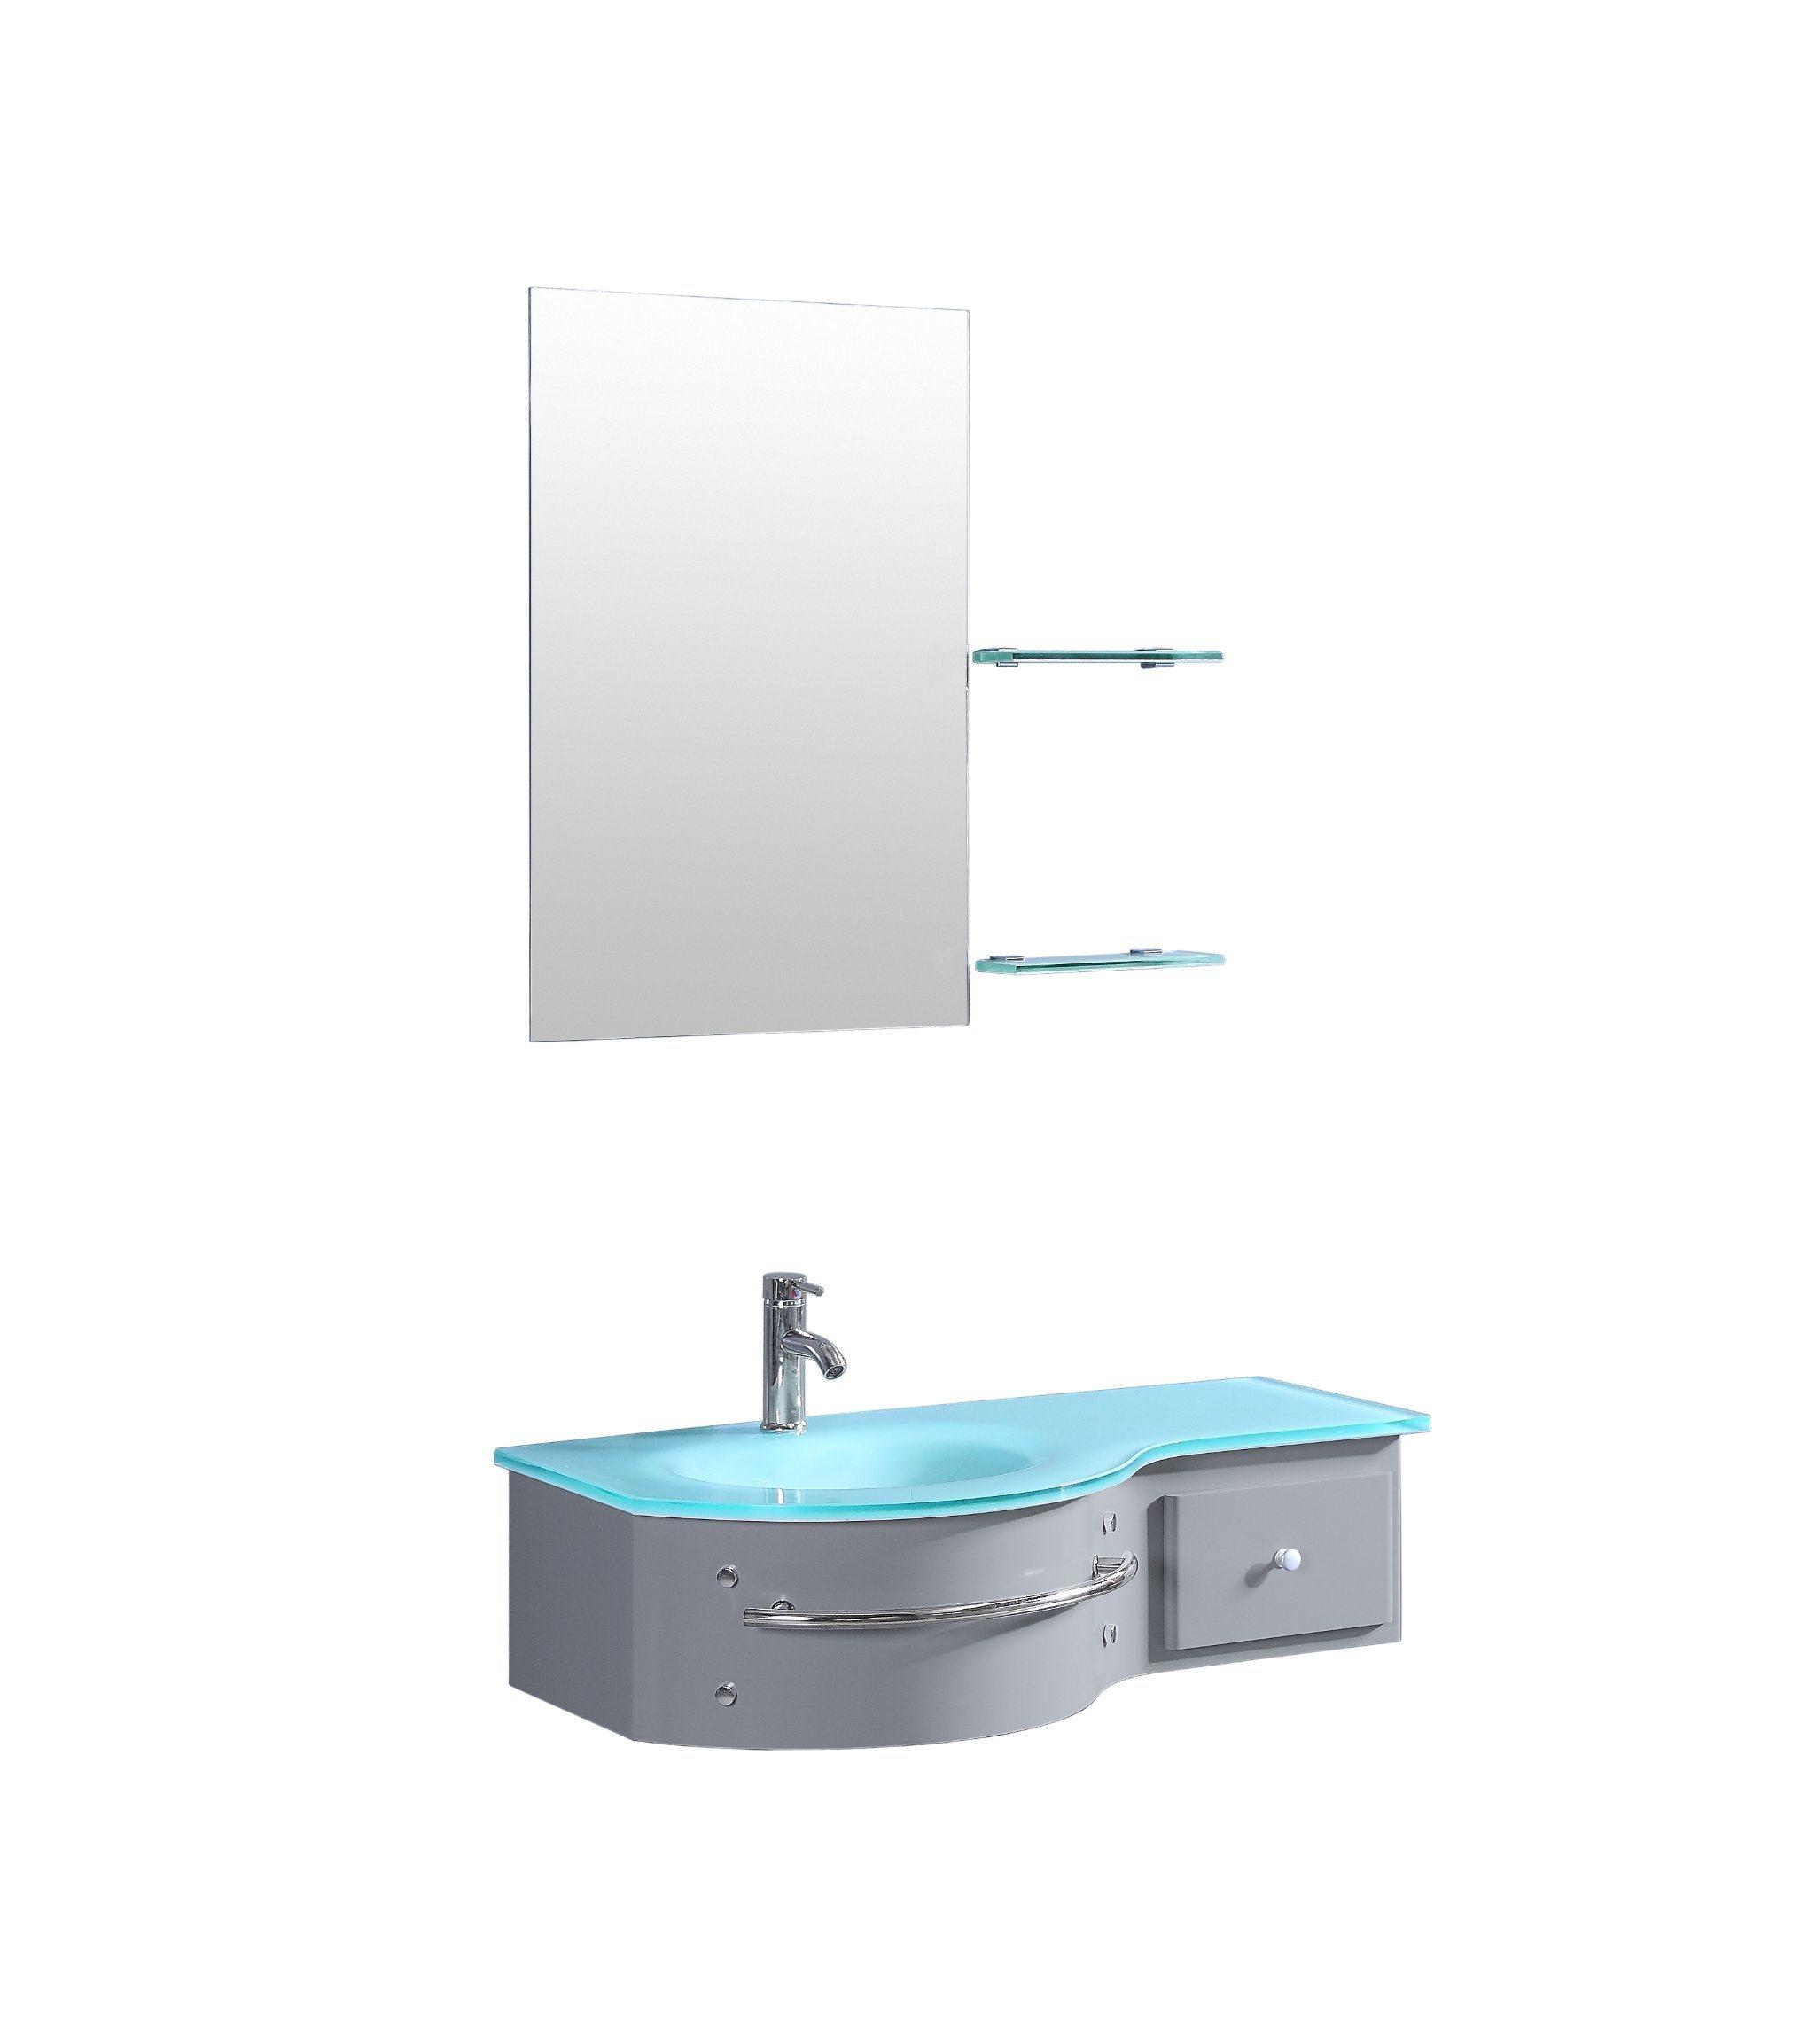 China Pvc Bathroom Corner Vanity With Glass Sink Top China Bathroom Vanity Bathroom Corner Vanity